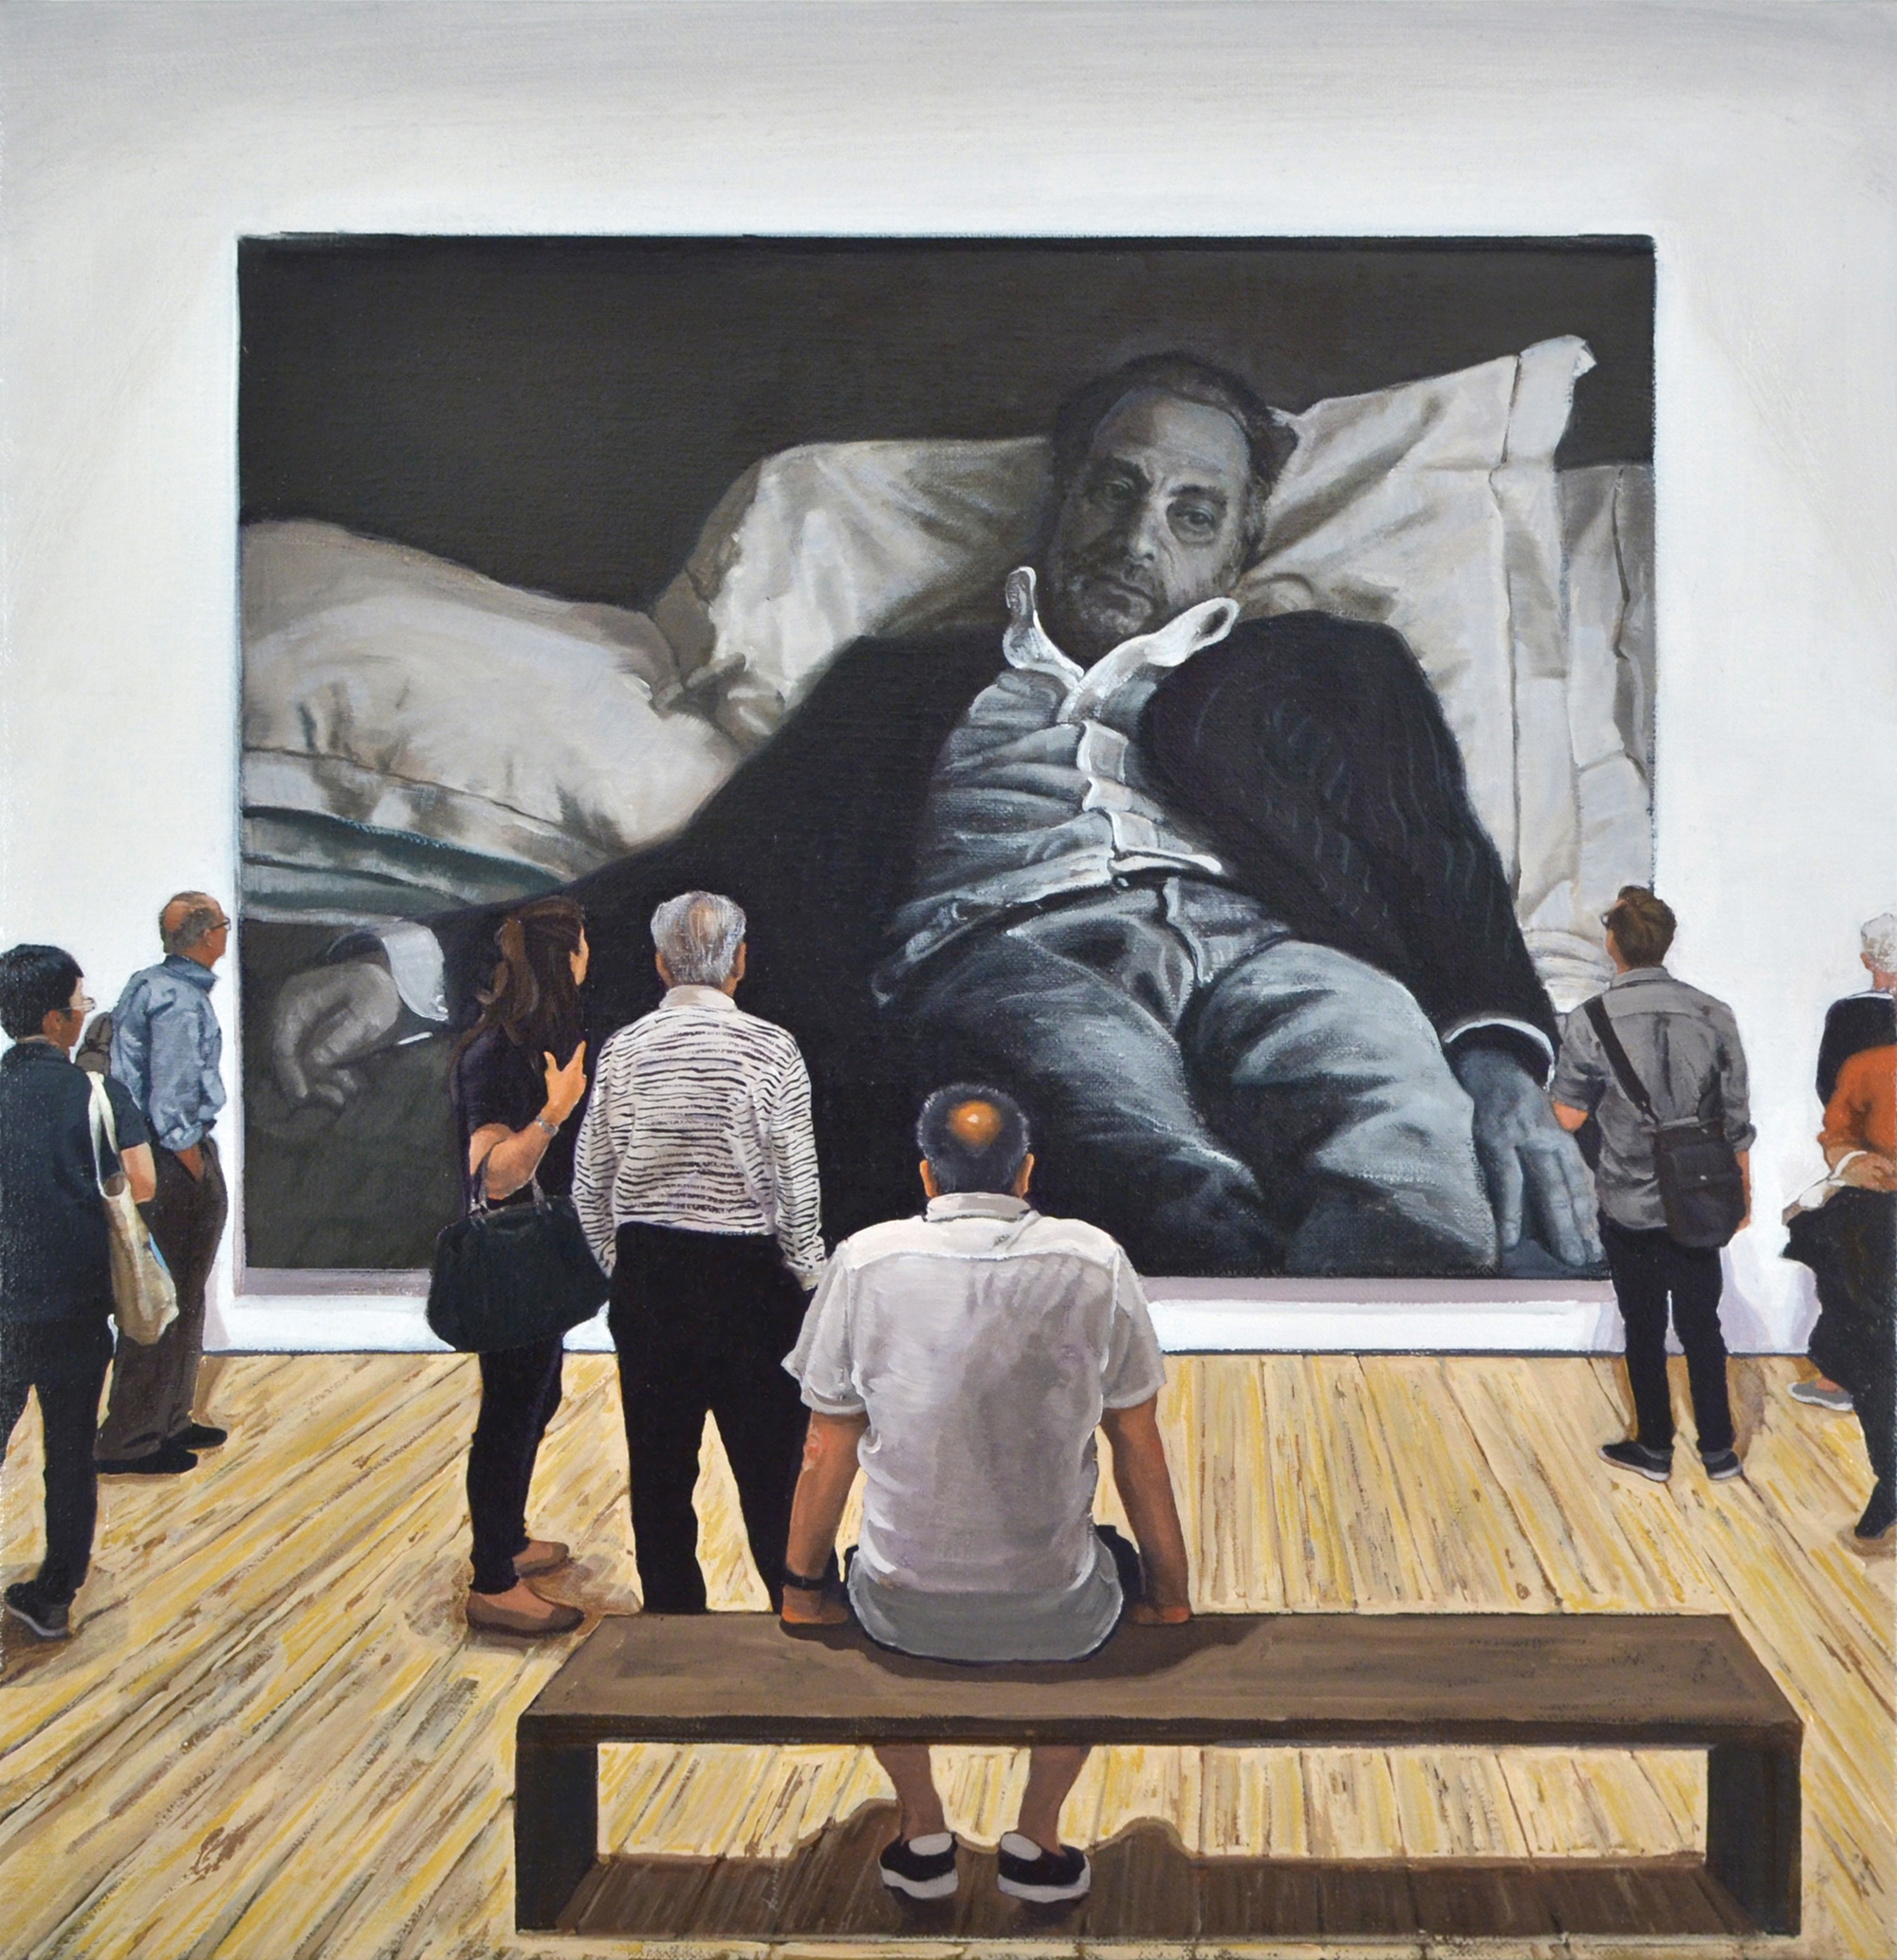 Rudolf Stingel: Untitled (After Sam) / Whitney